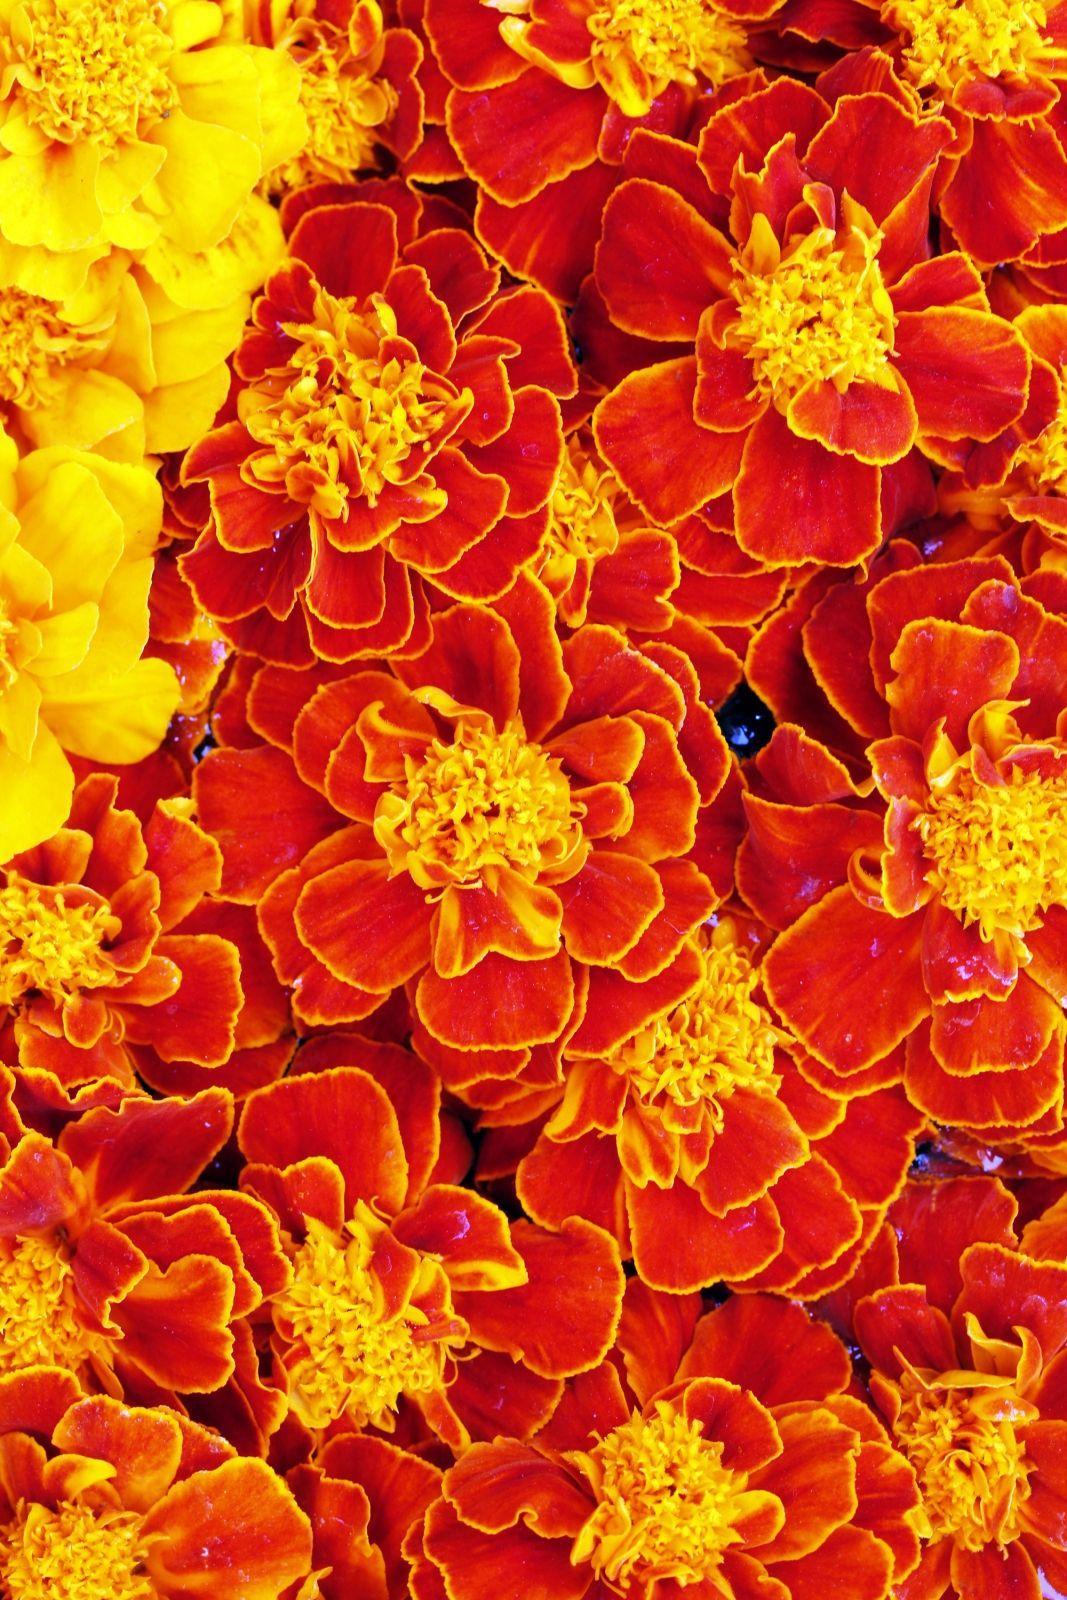 marigold indian interior decor Google Search Marigold